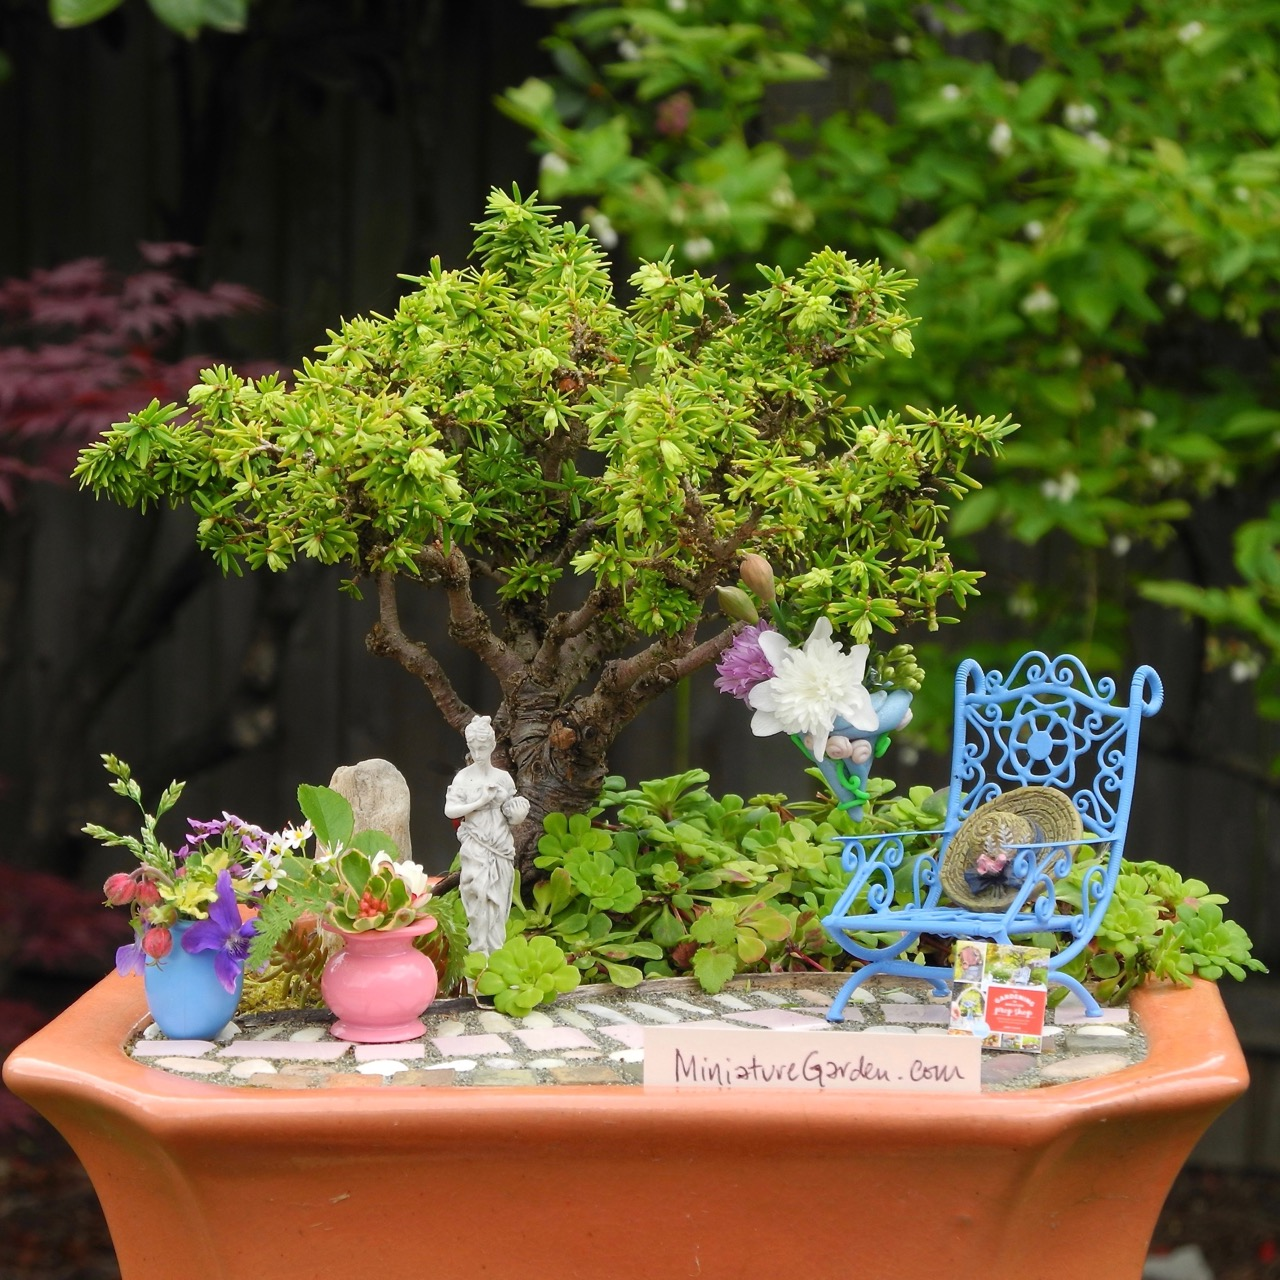 Miniature Gardening with Mom & MiniatureGarden.com